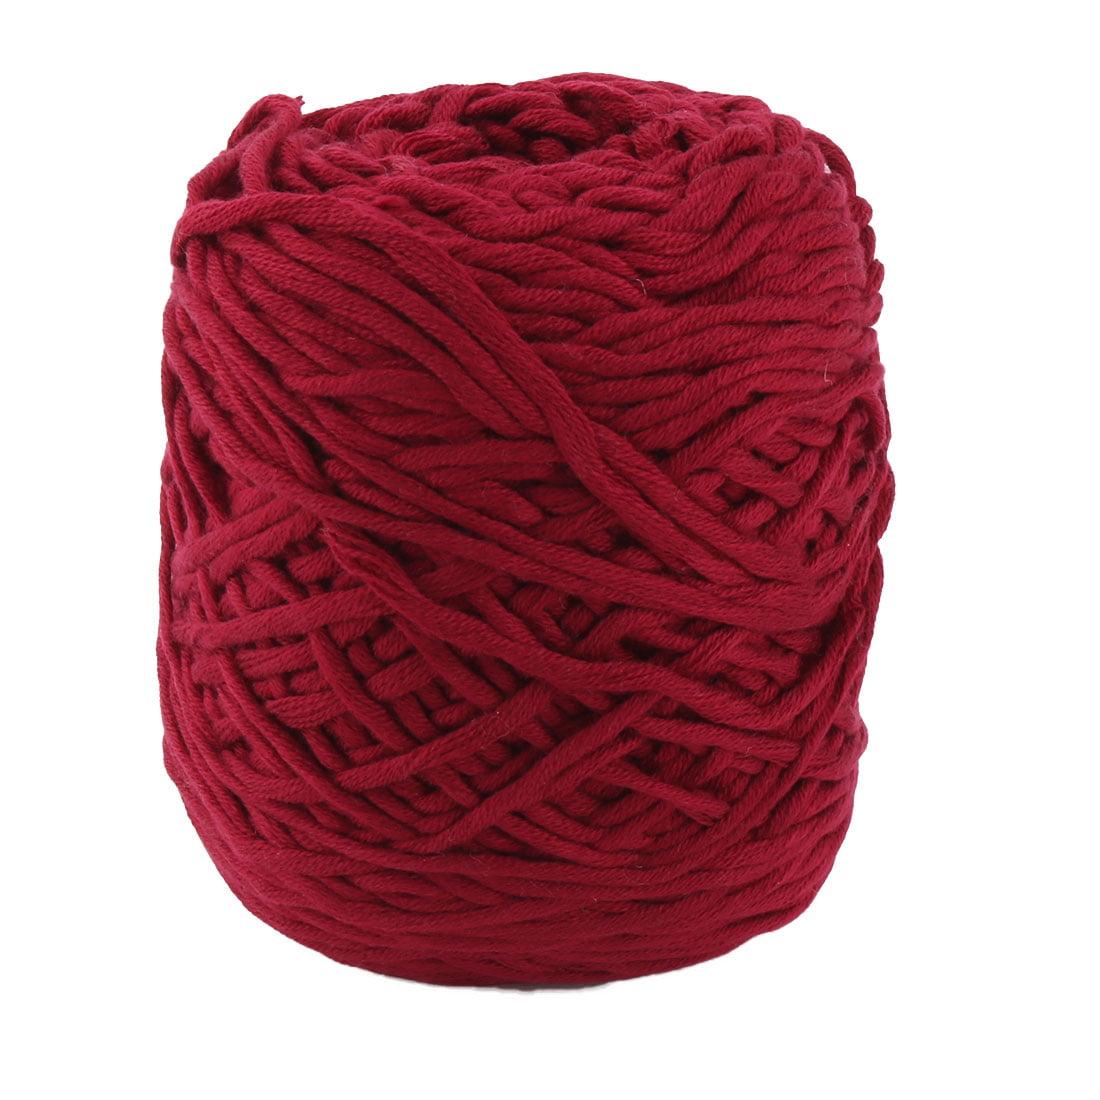 Acrylic Fiber Handmade Crochet Scarf Sweater Knitting Yarn Cord Burgundy 200g